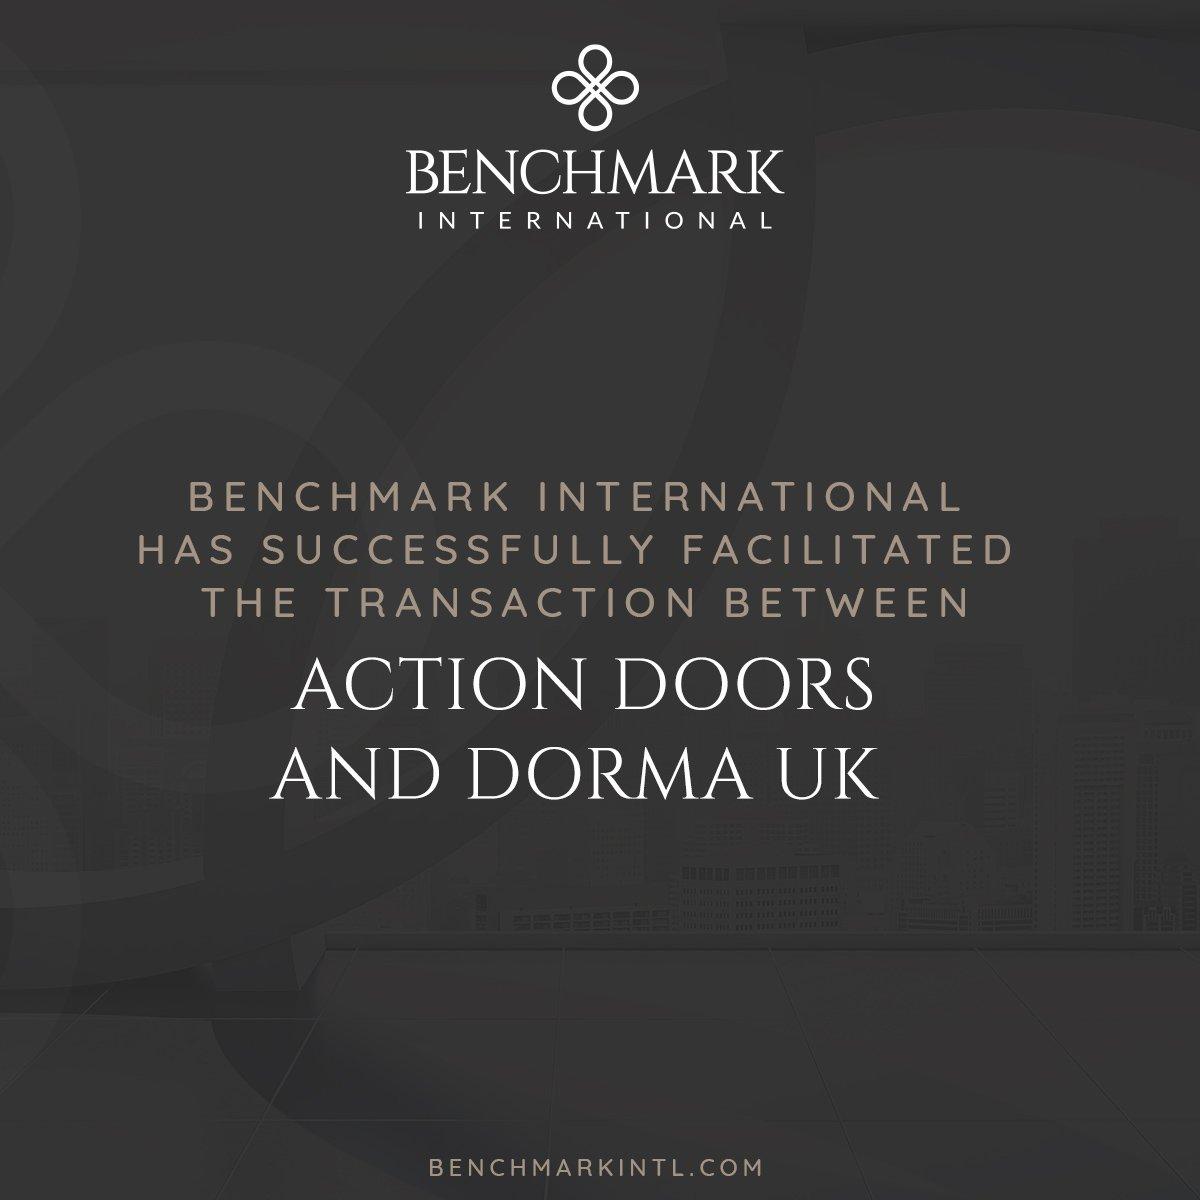 Action Doors acquired by Dormakaba UK